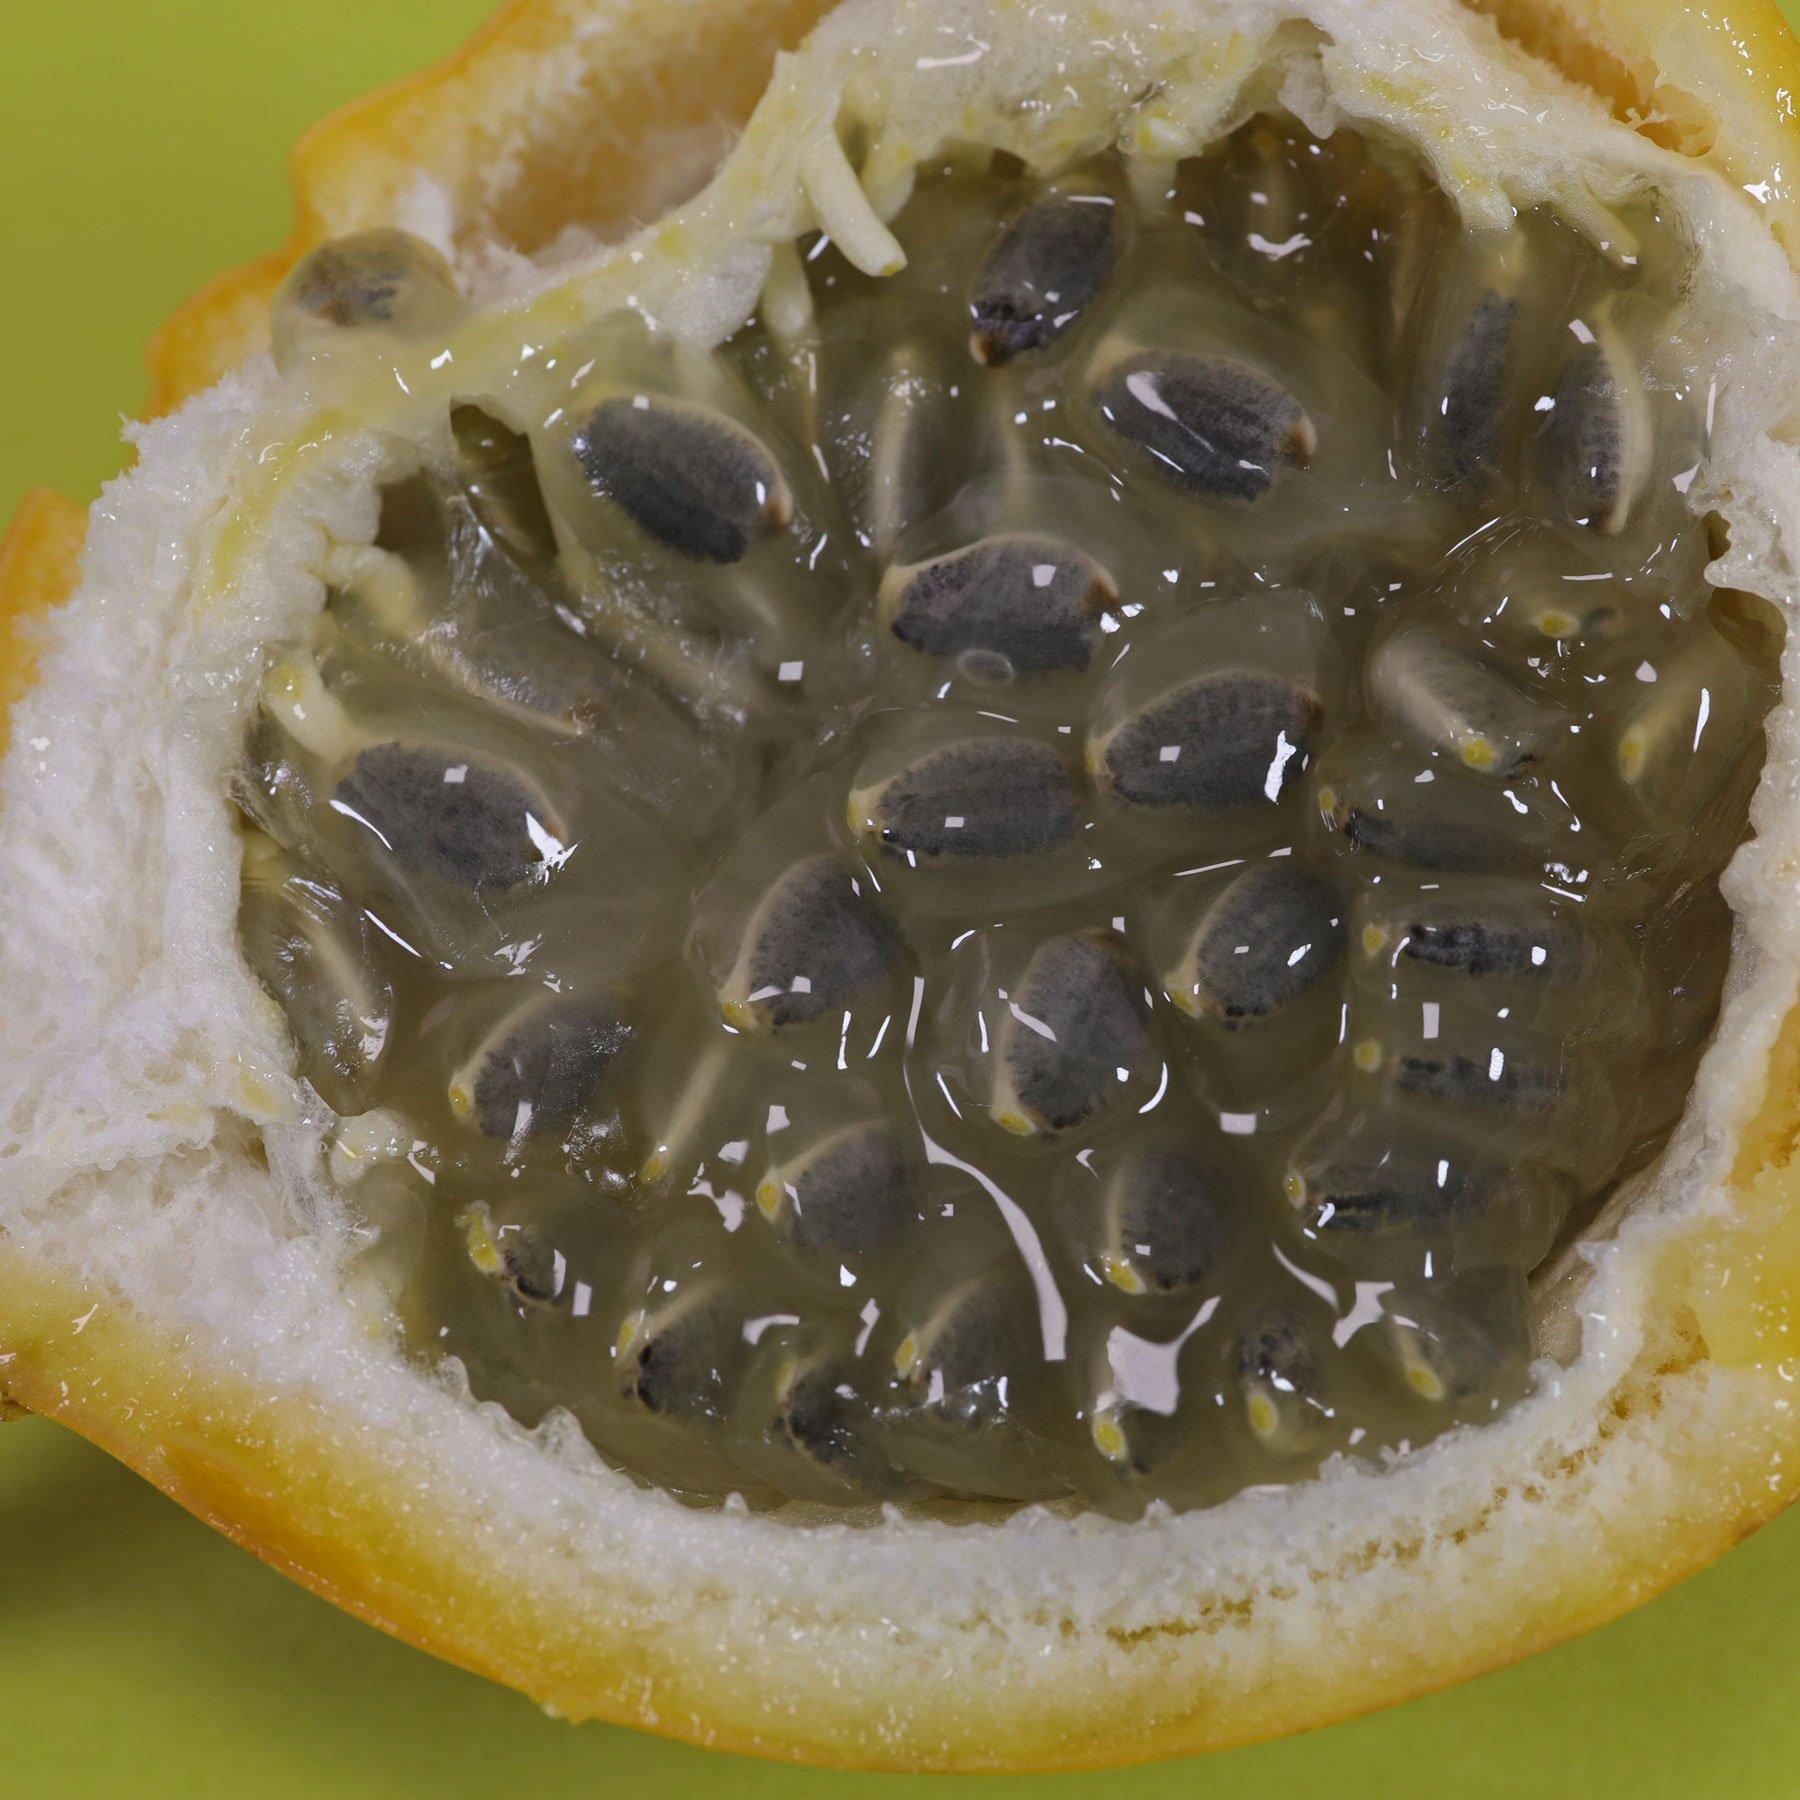 Granadilla seeds